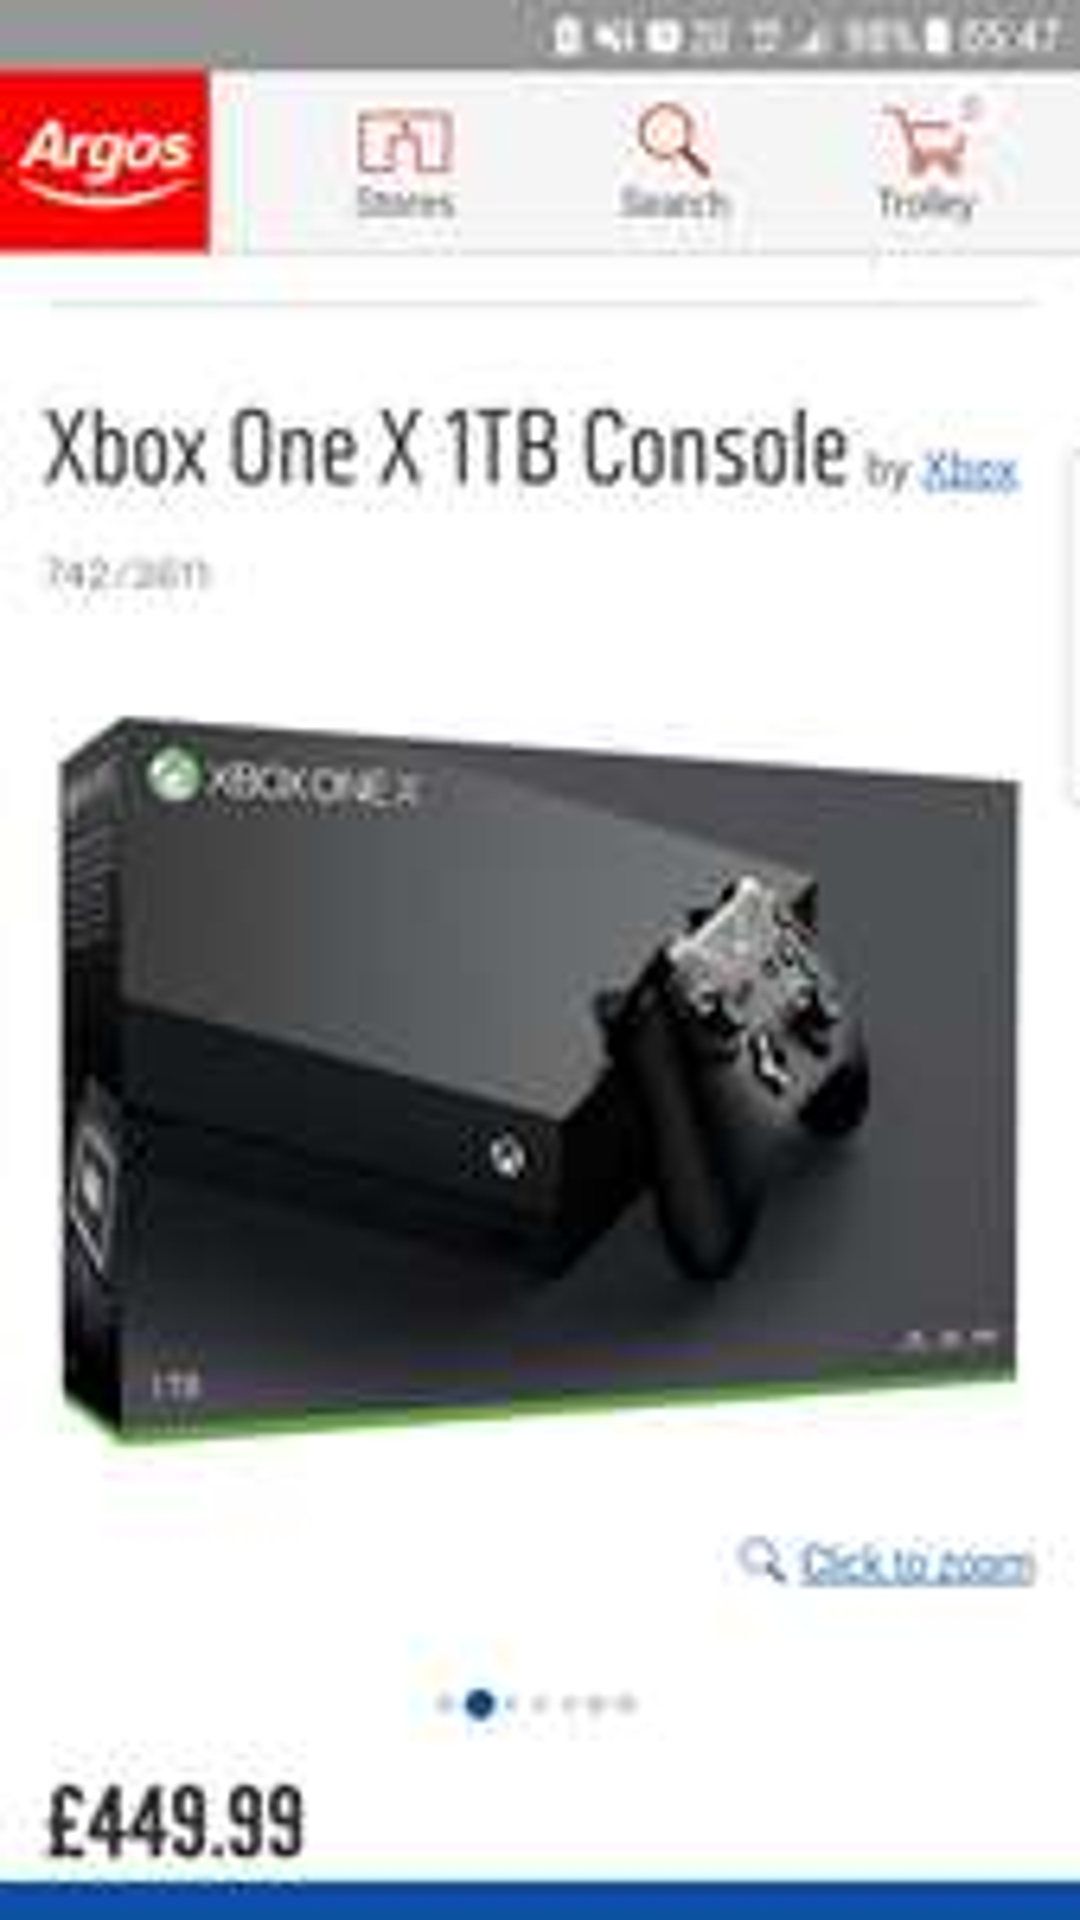 Xbox one x  + Pubg + Forza 7 Plus an extra controller £479.99 - Argos